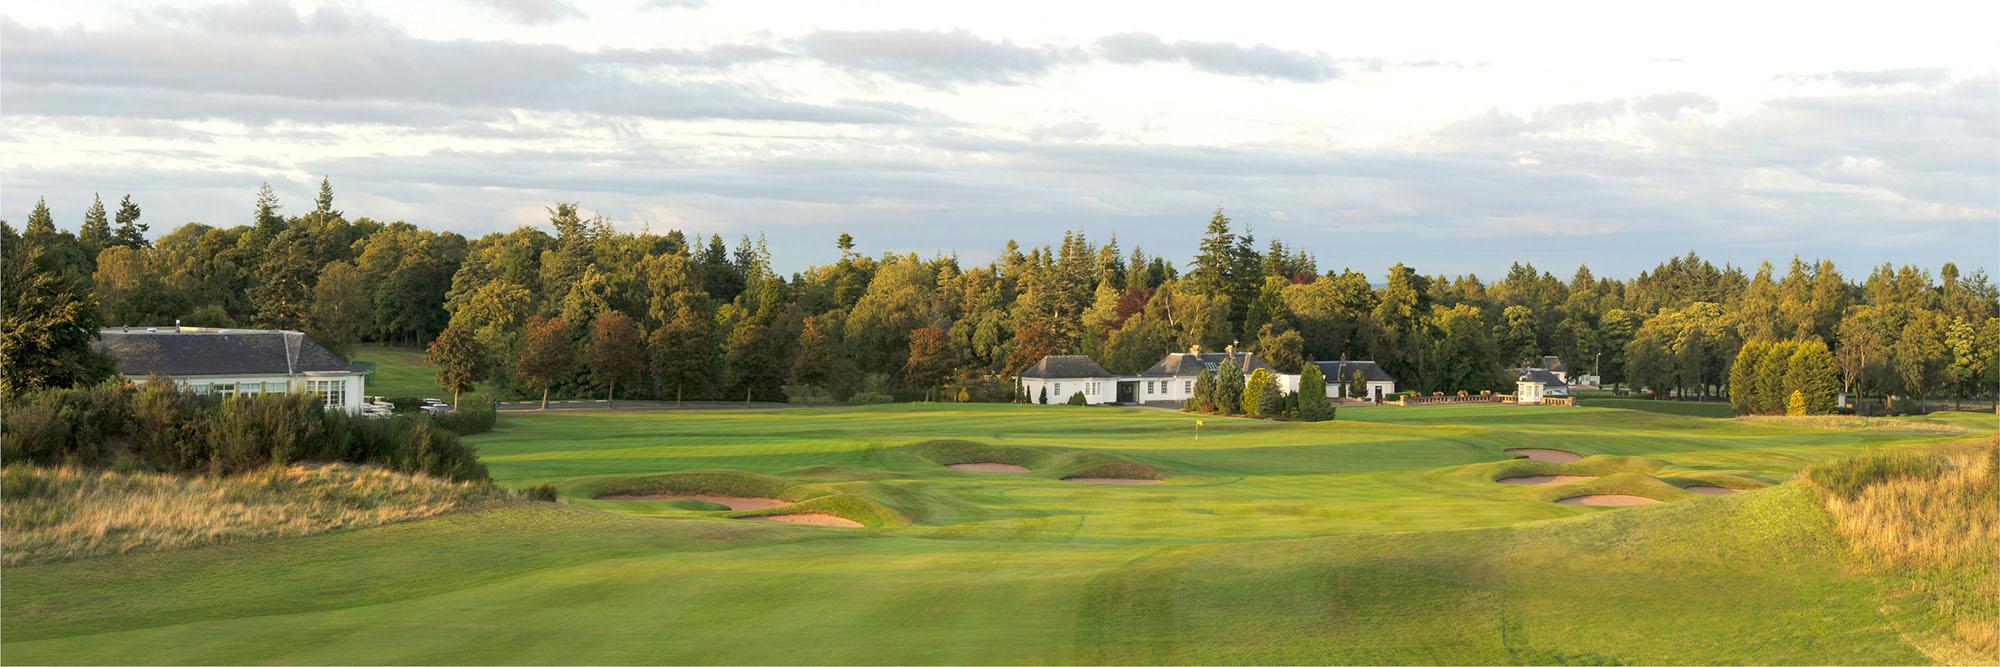 Golf Course Image - Gleneagles Kings No. 18